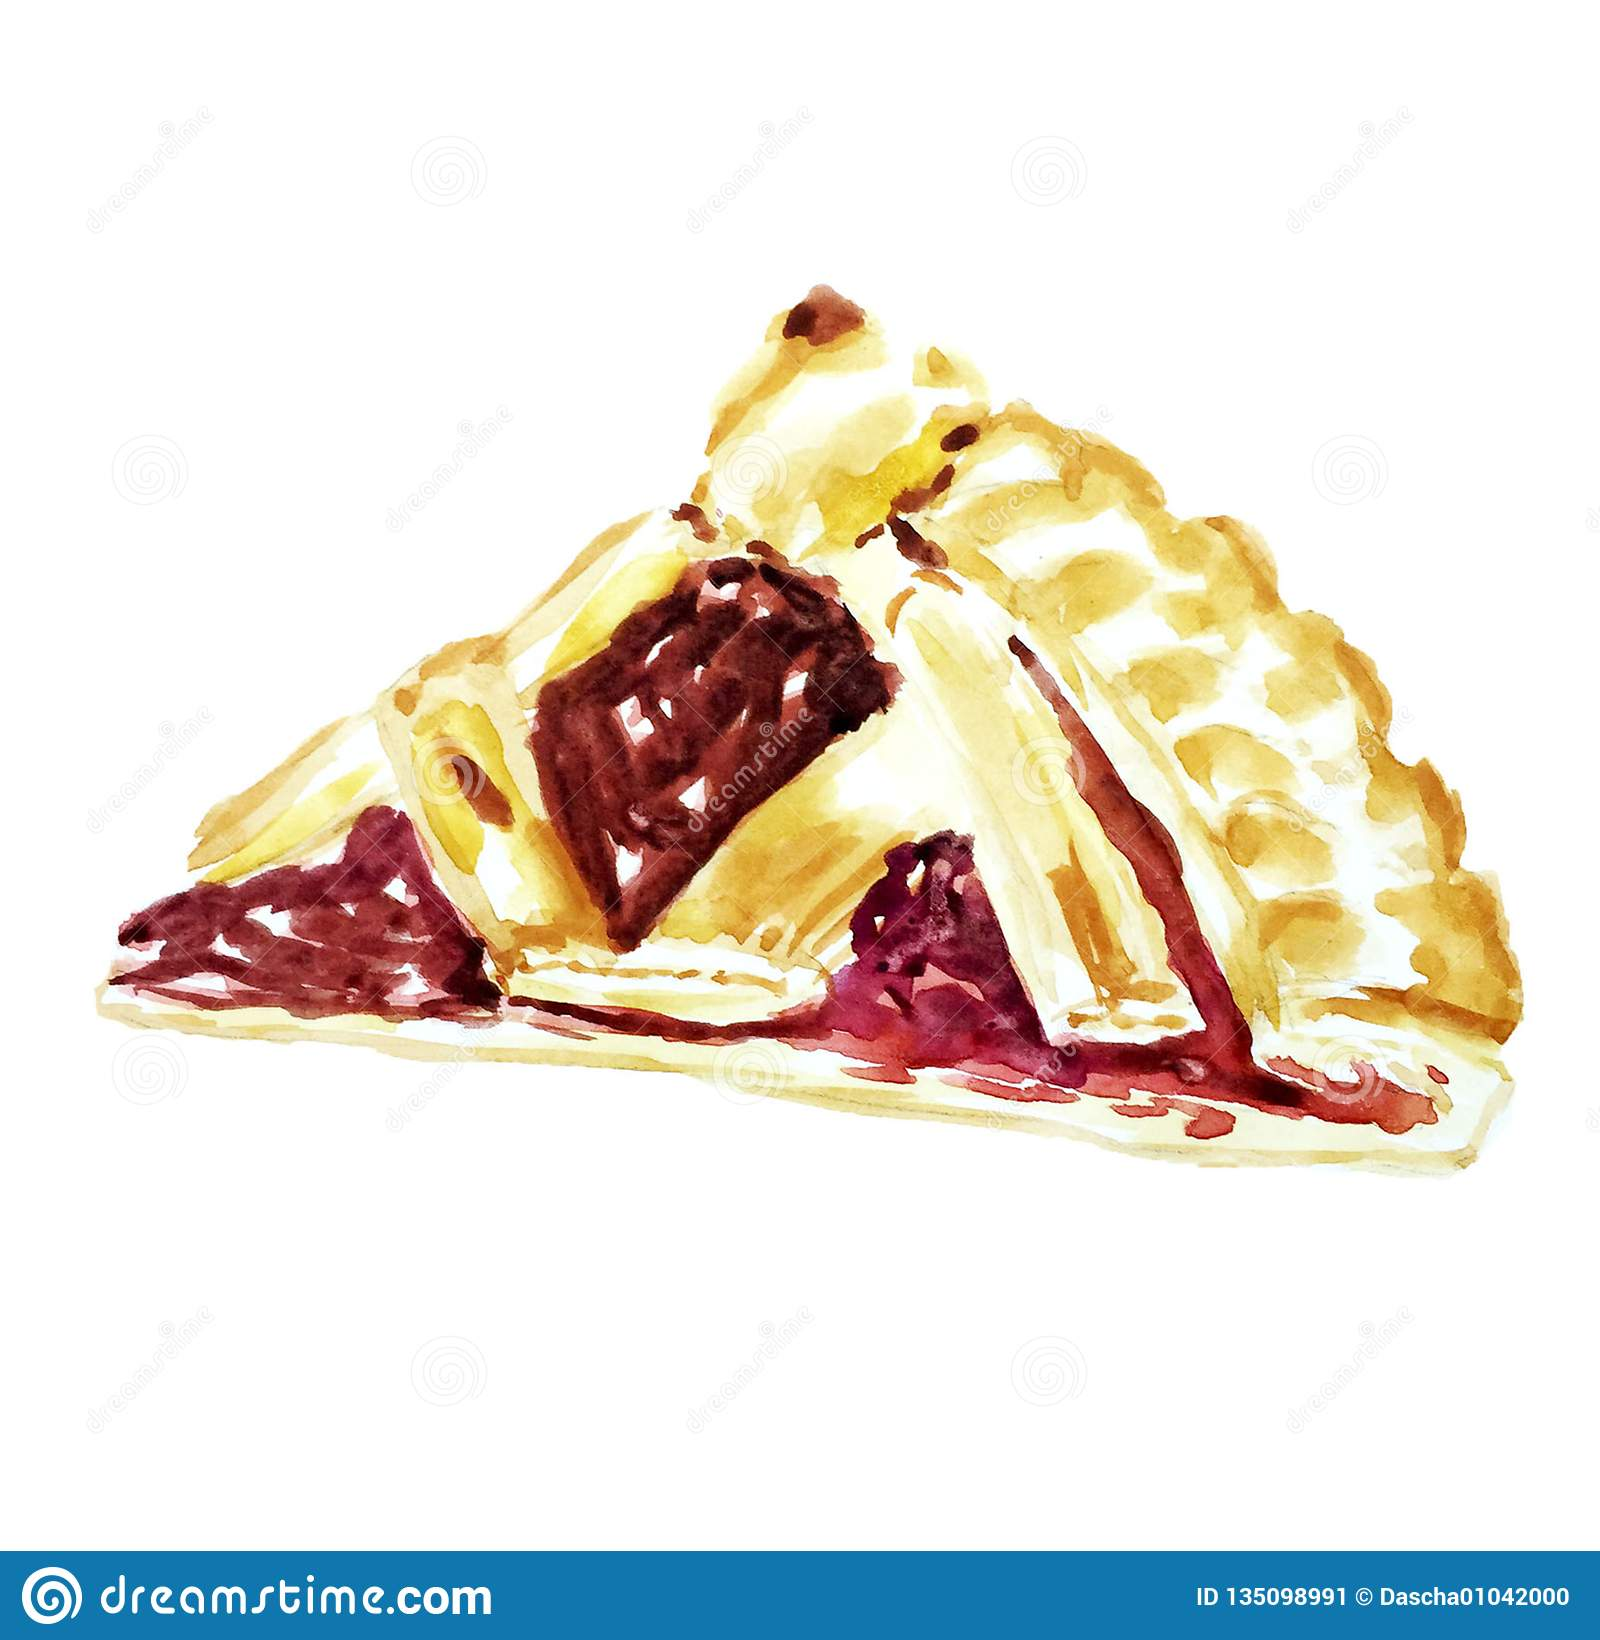 Cherry pie slice watercolor illustration isolated